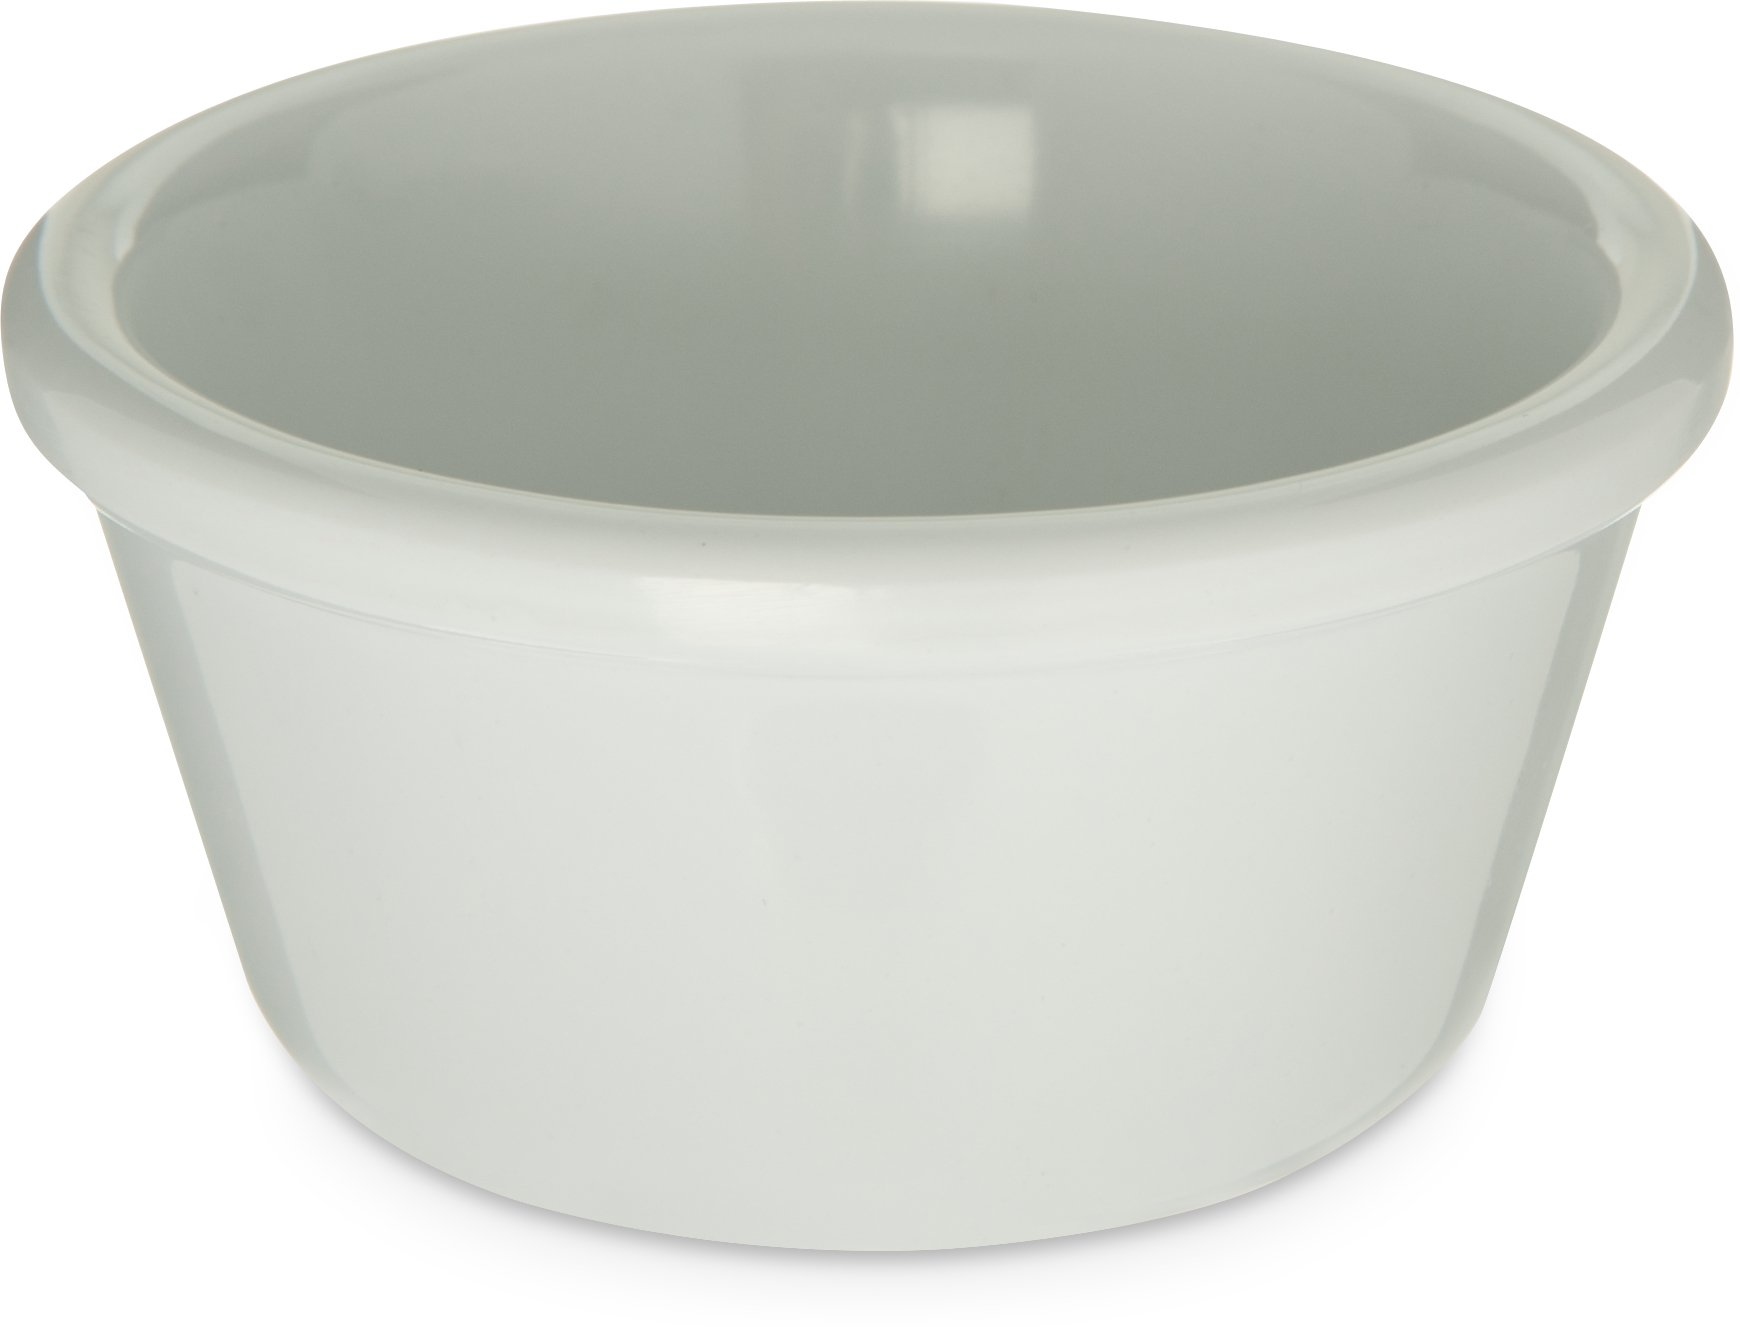 Carlisle S28002 Melamine Smooth Ramekin, 3 oz. Capacity, White (Case of 48)